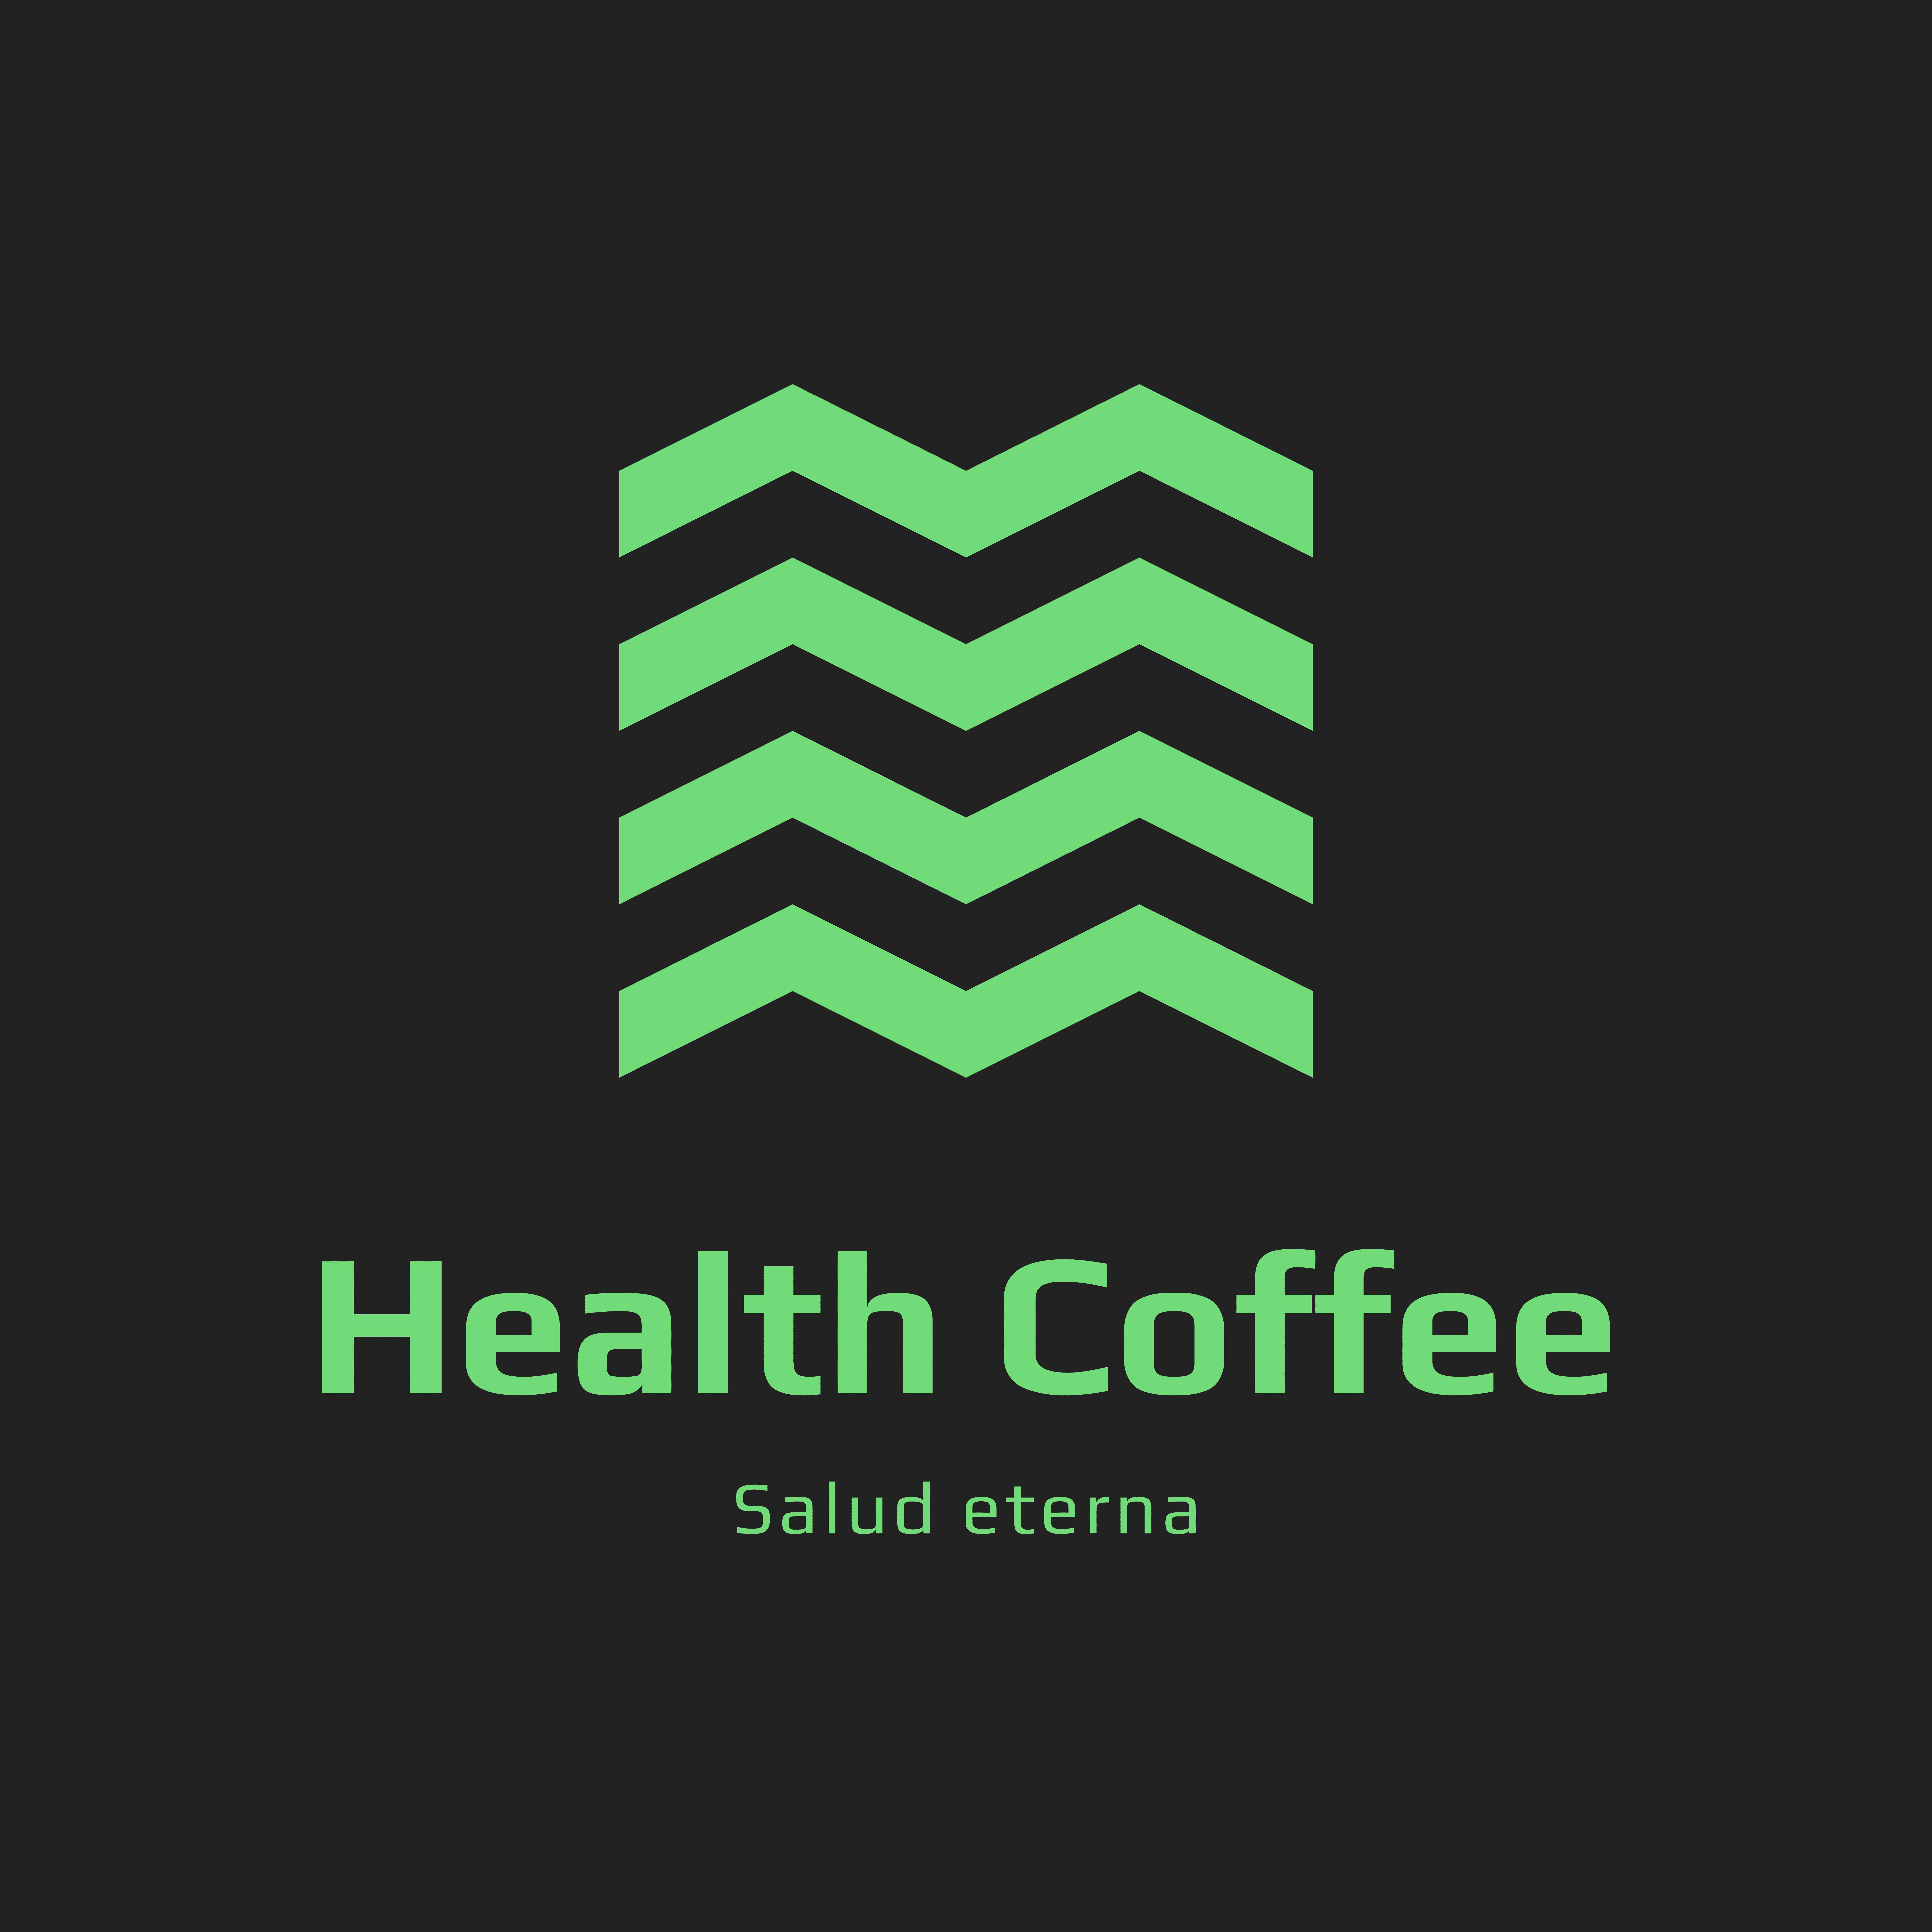 Healt Coffee